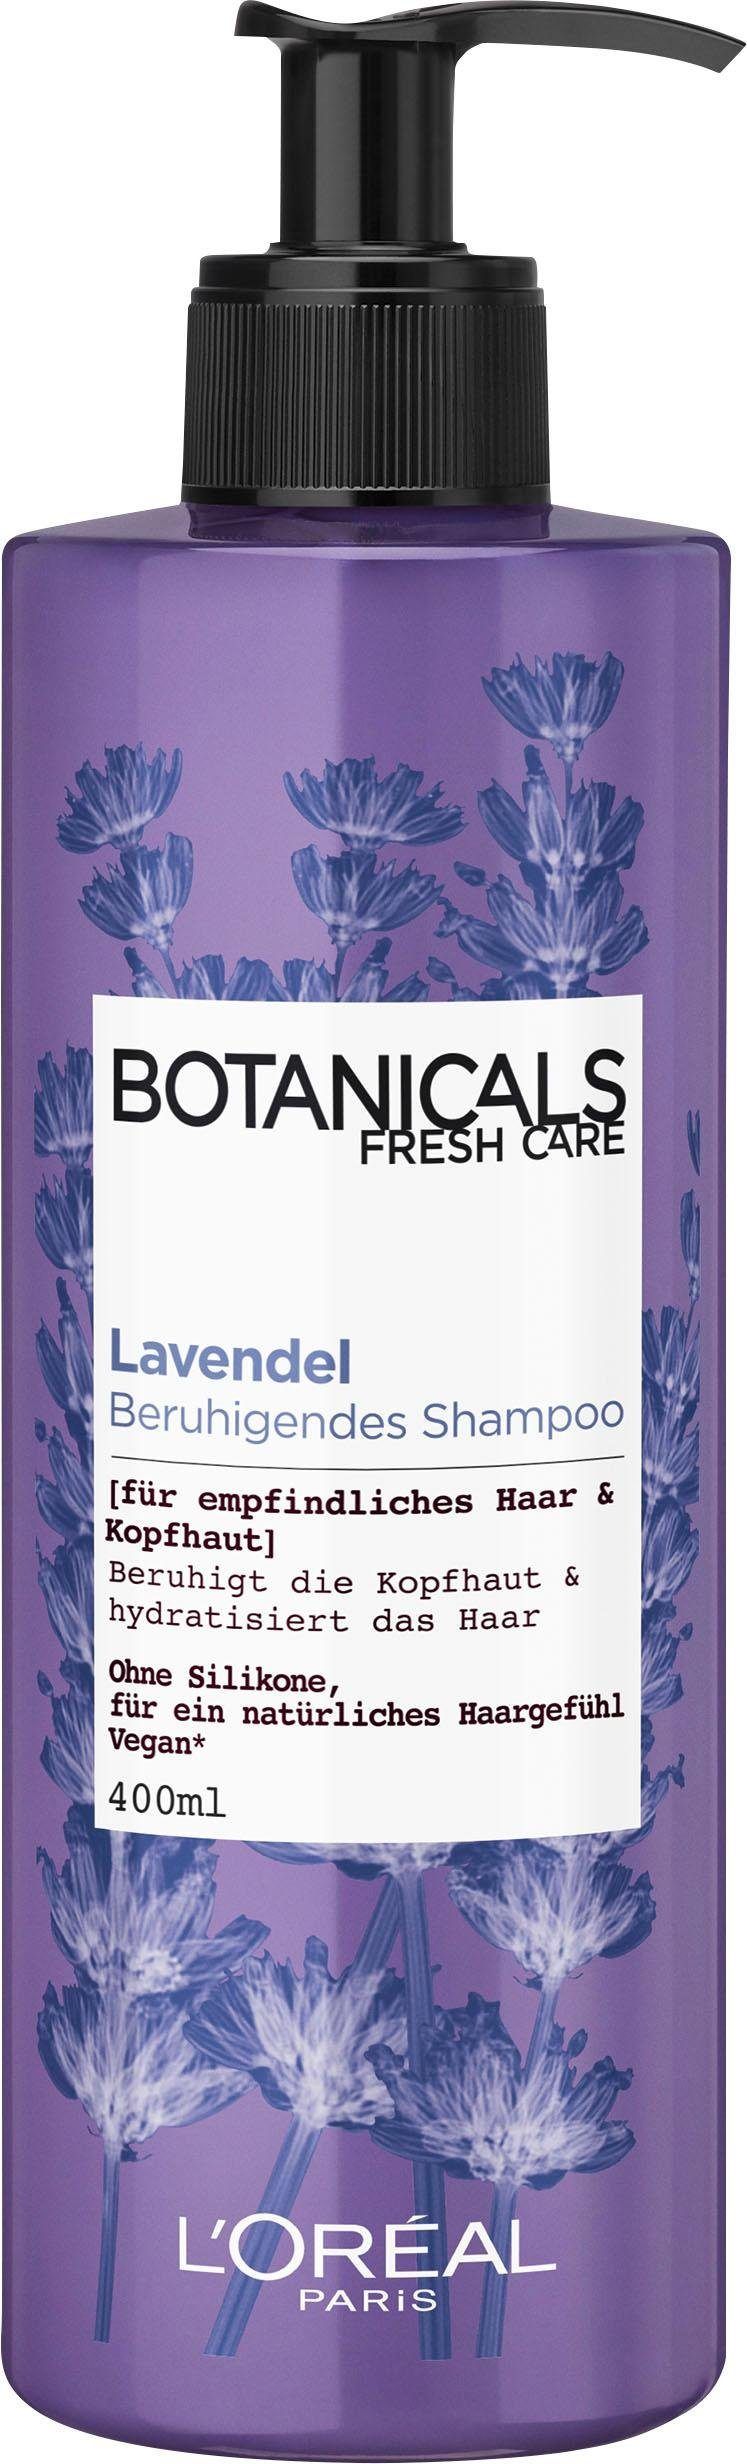 BOTANICALS Haarshampoo »Lavendel Hydratisierende Pflege«